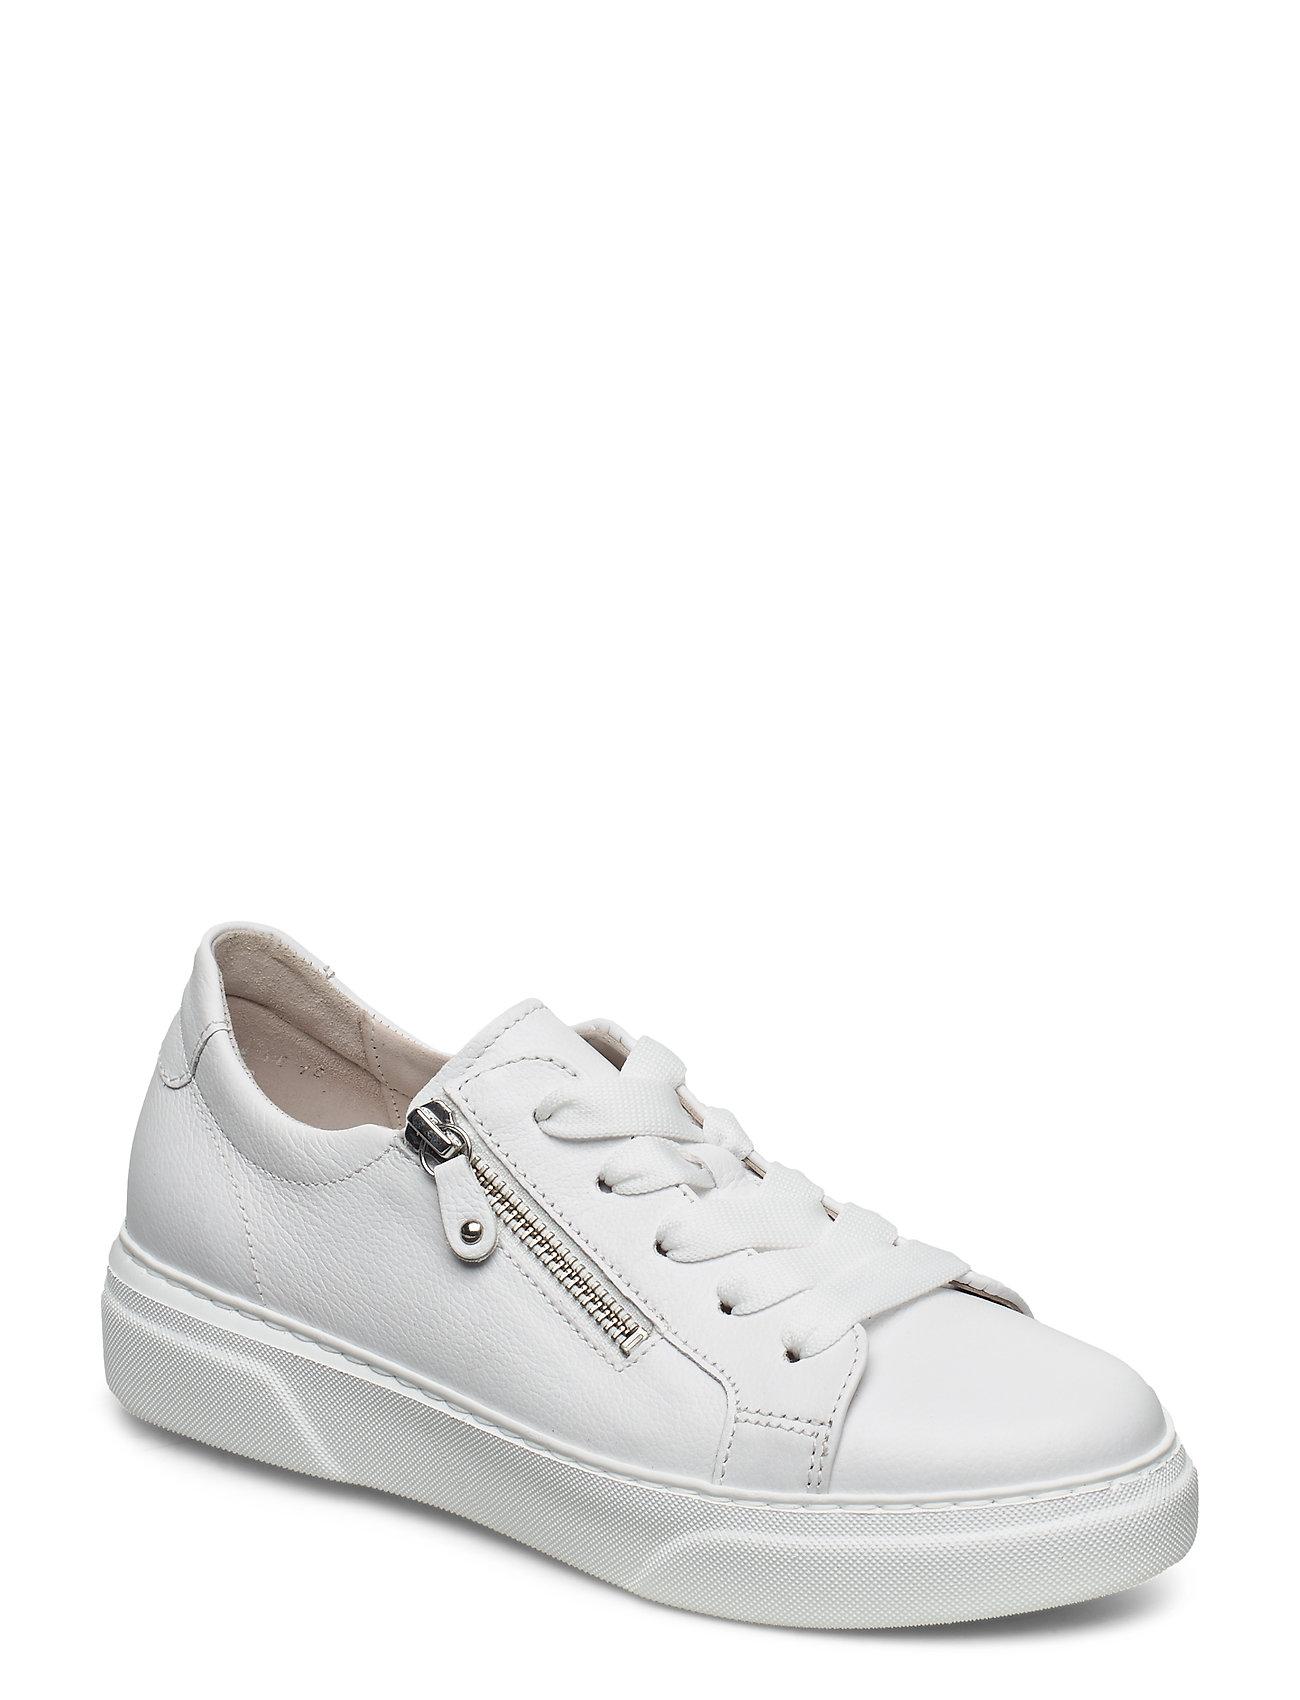 Image of Sneaker Low-top Sneakers Hvid Gabor (3406282421)